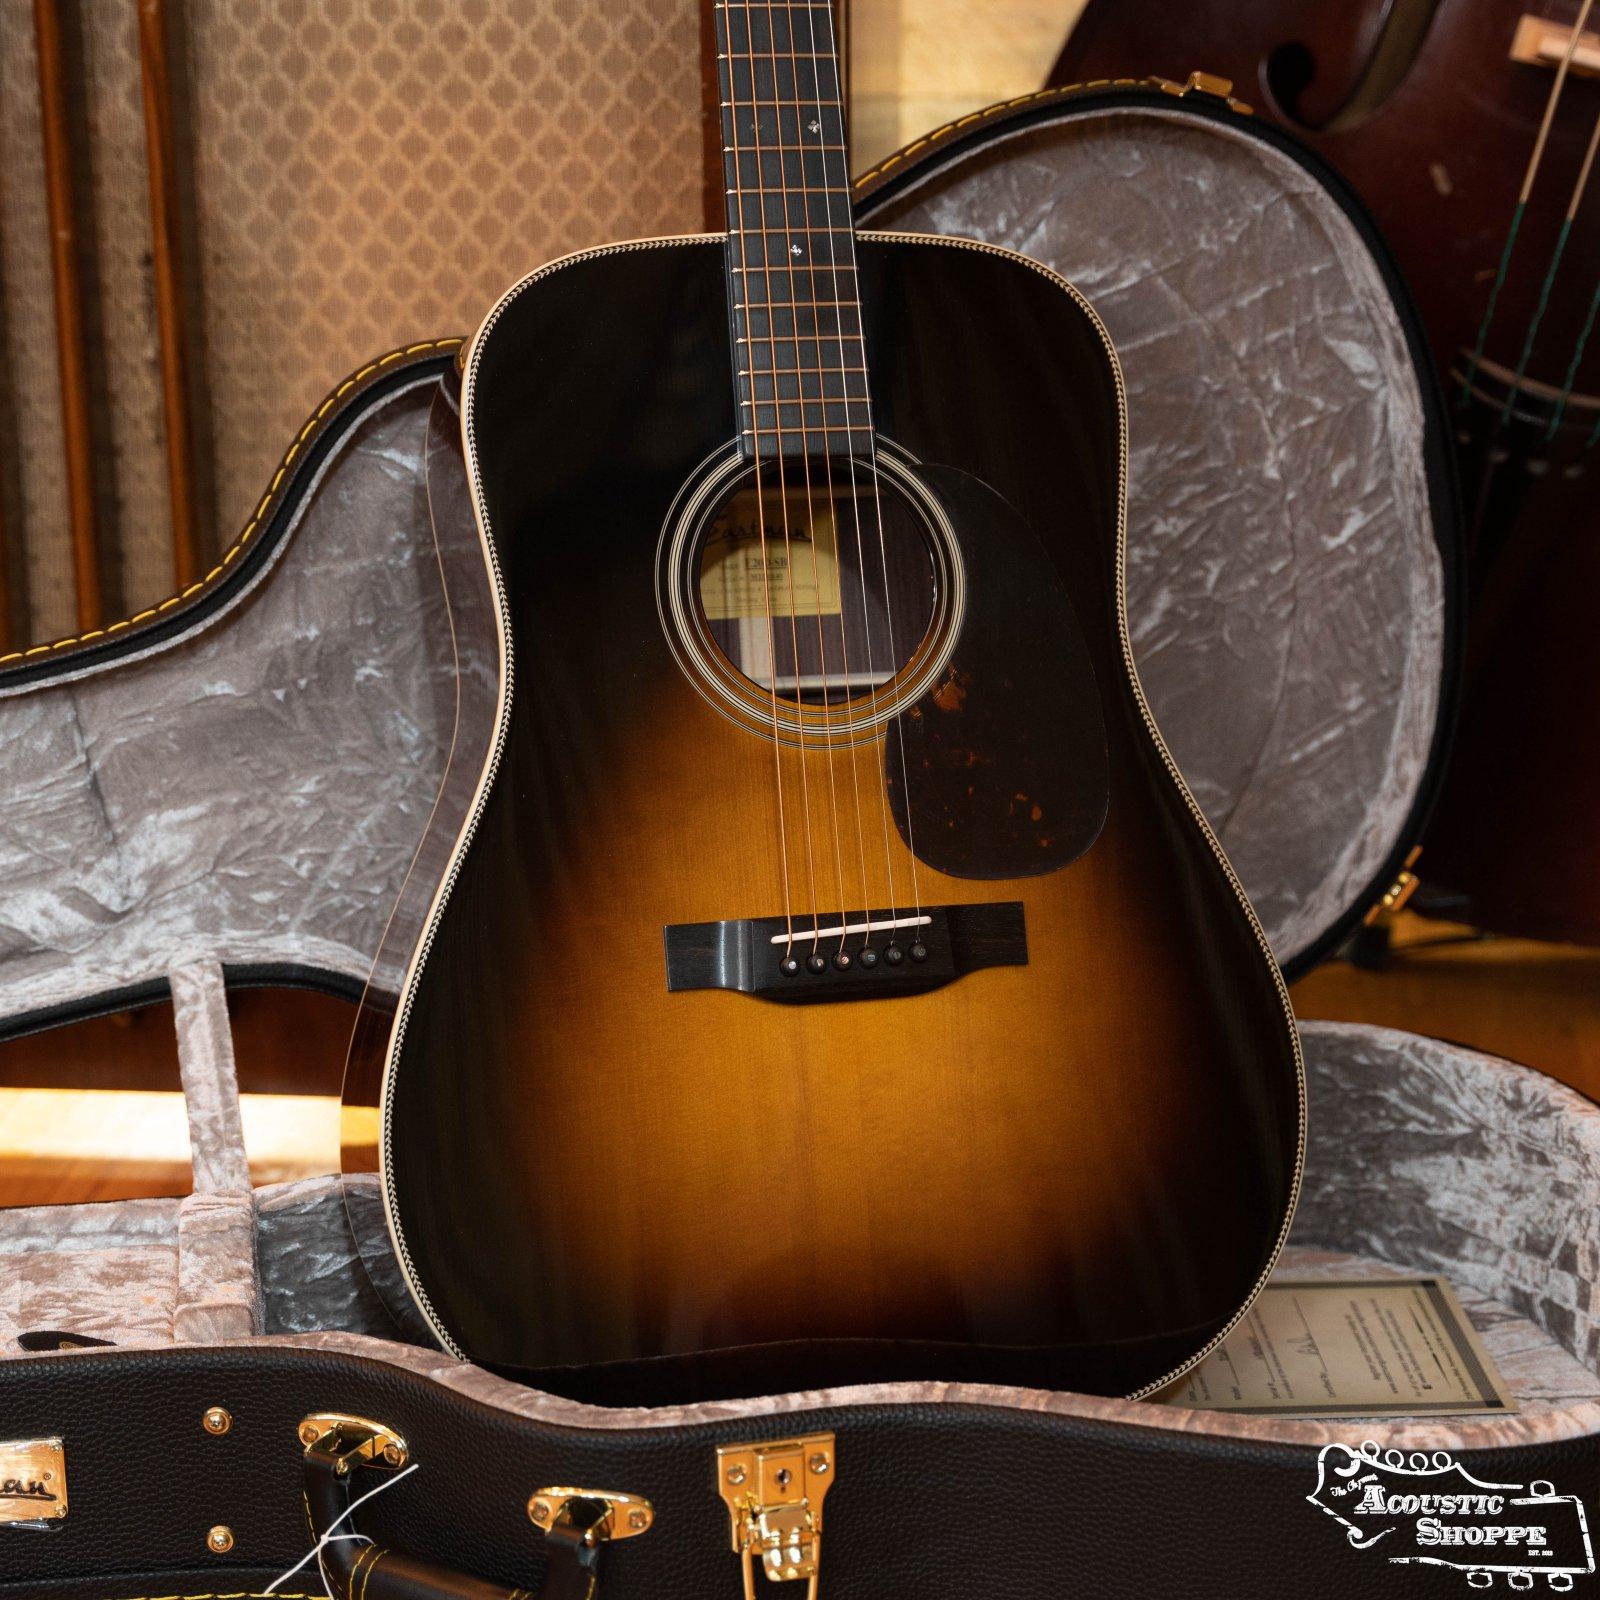 Eastman E20D-SB Traditional Rosewood Sunburst Dreadnaught Acoustic Guitar #3140